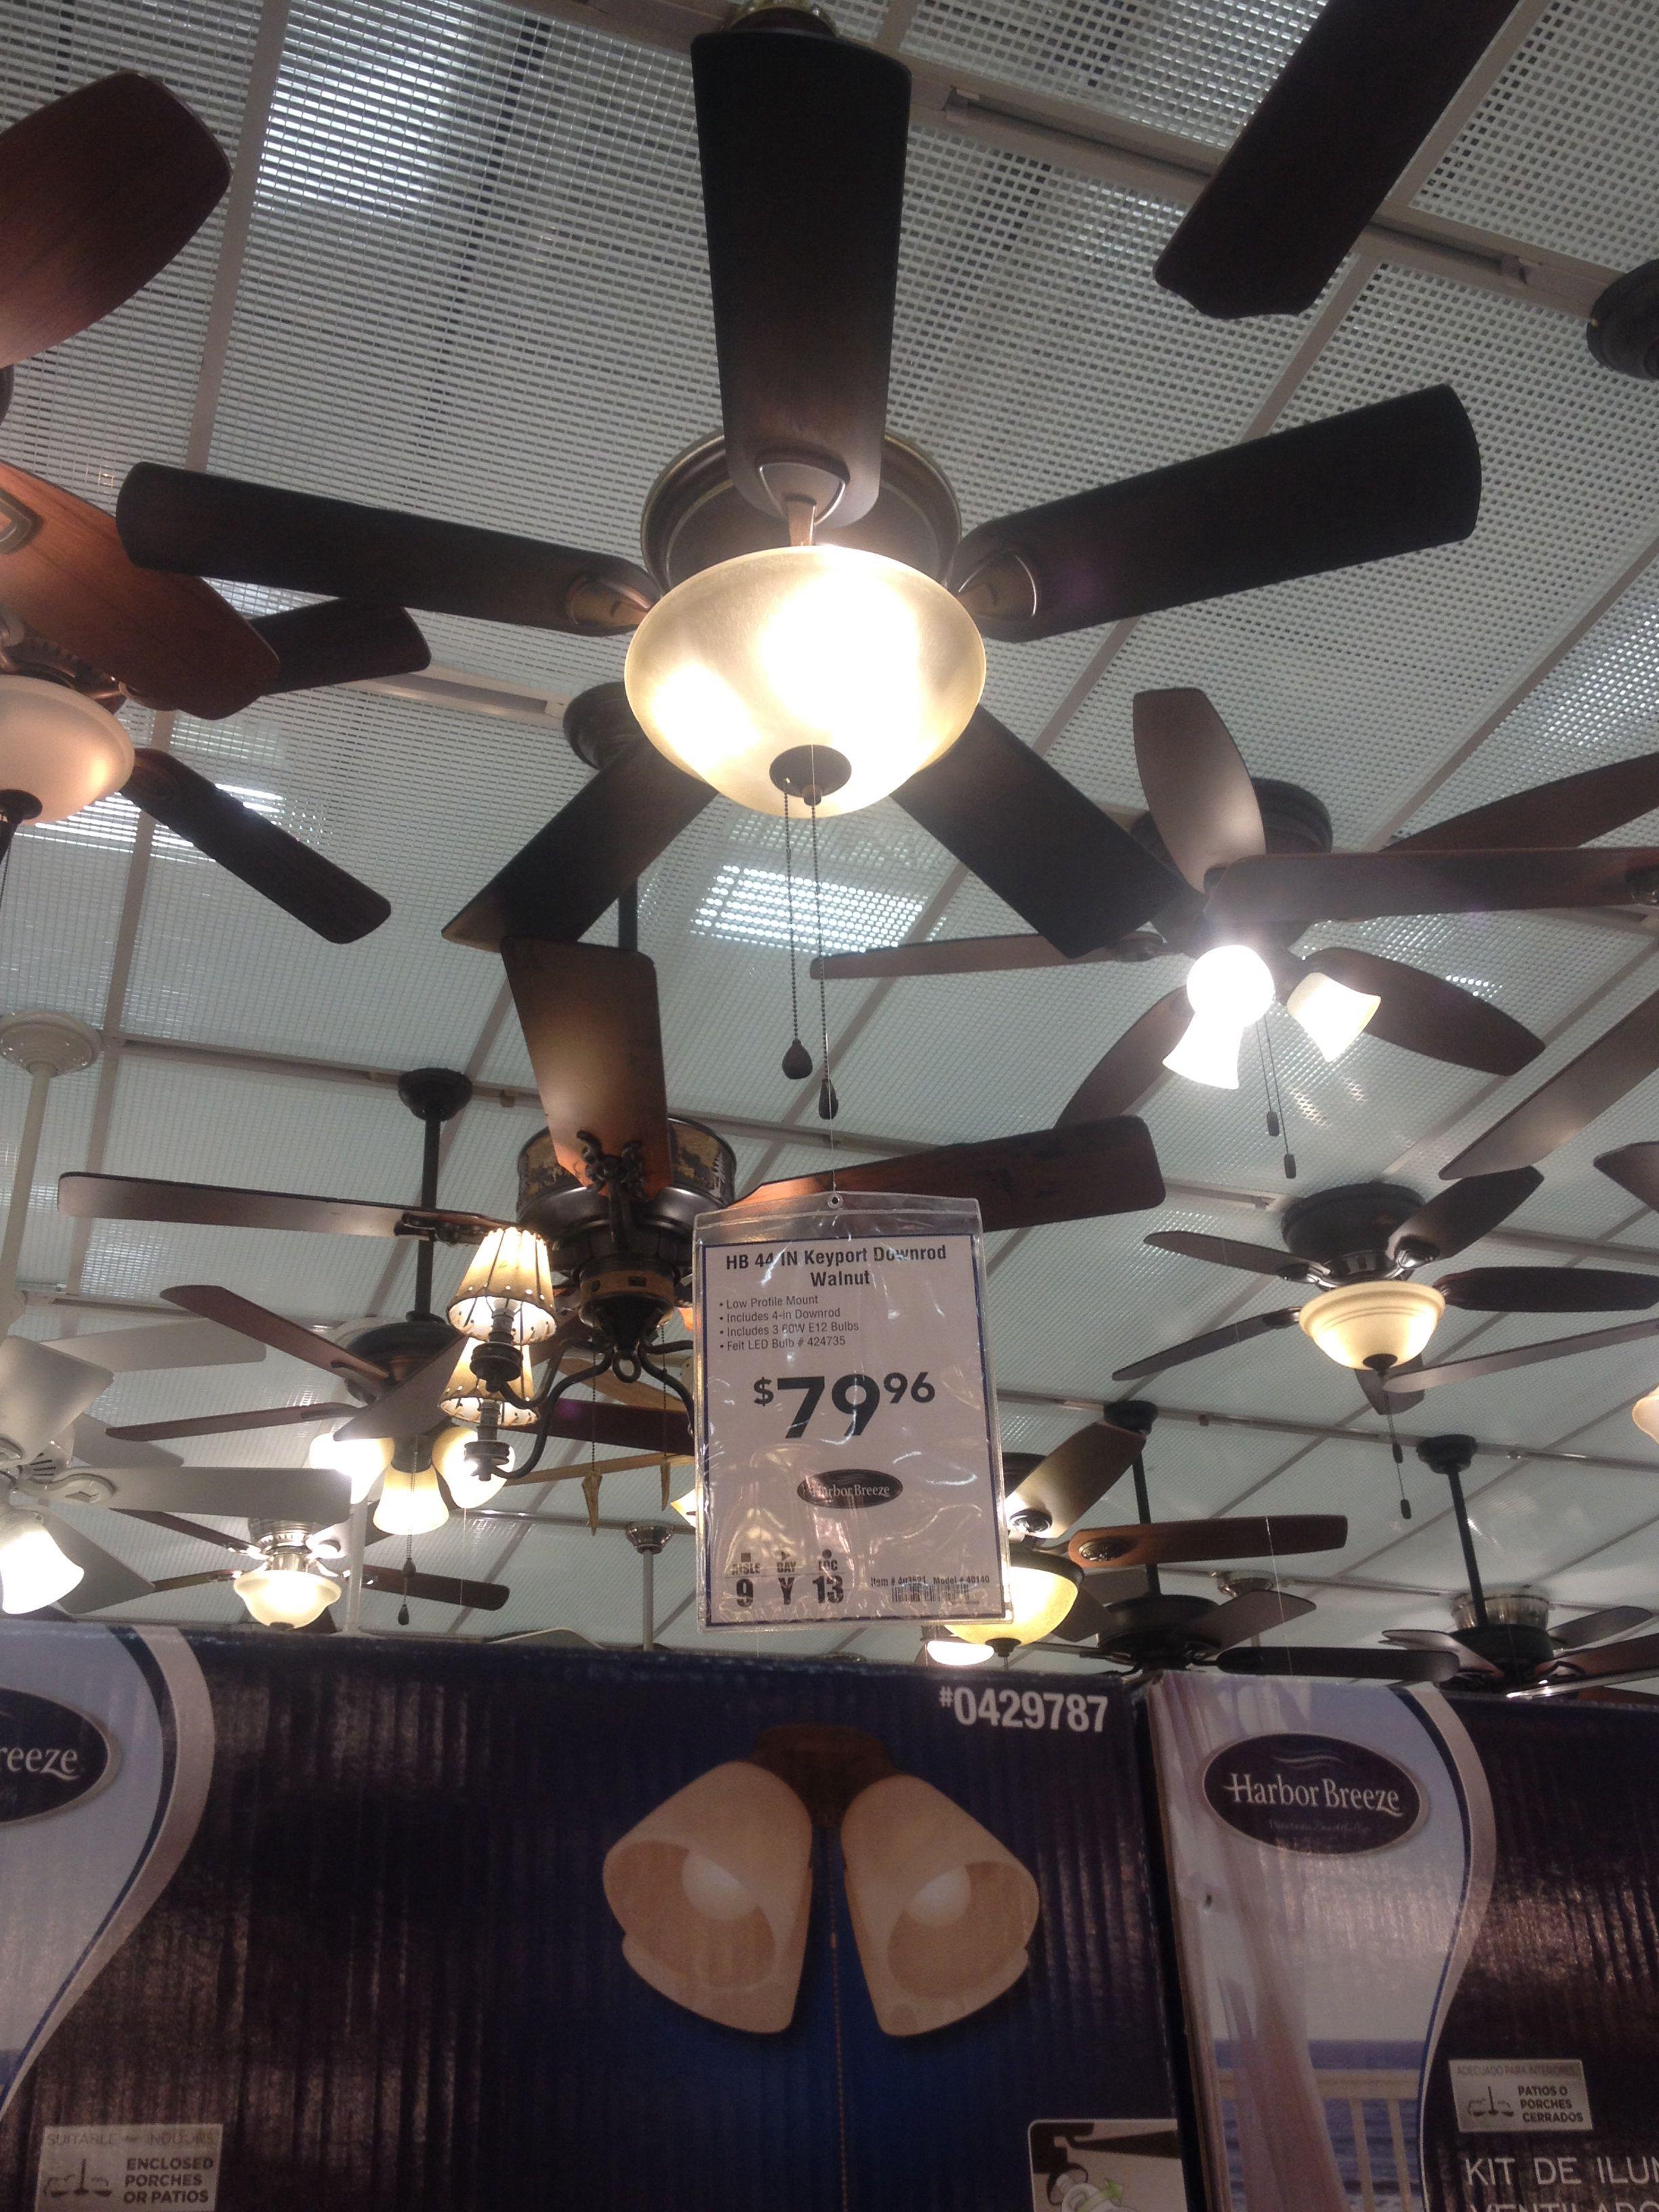 Lowes ceiling fan for master bedroom? Ceiling fan, Ceiling